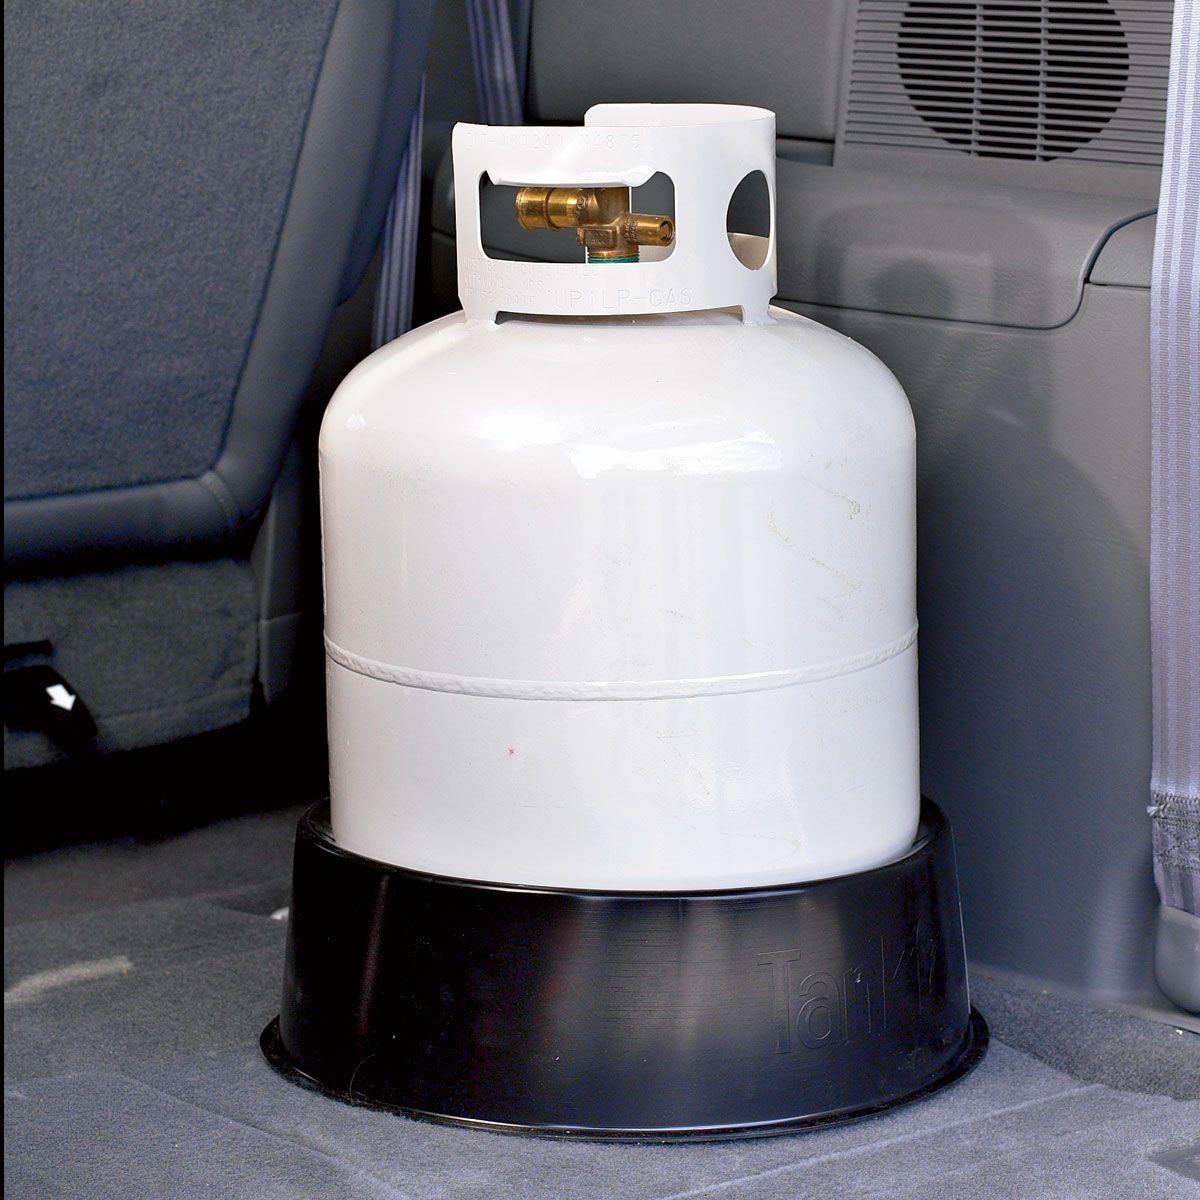 Propane Tank Holder Propane Tank Propane Portable Heater